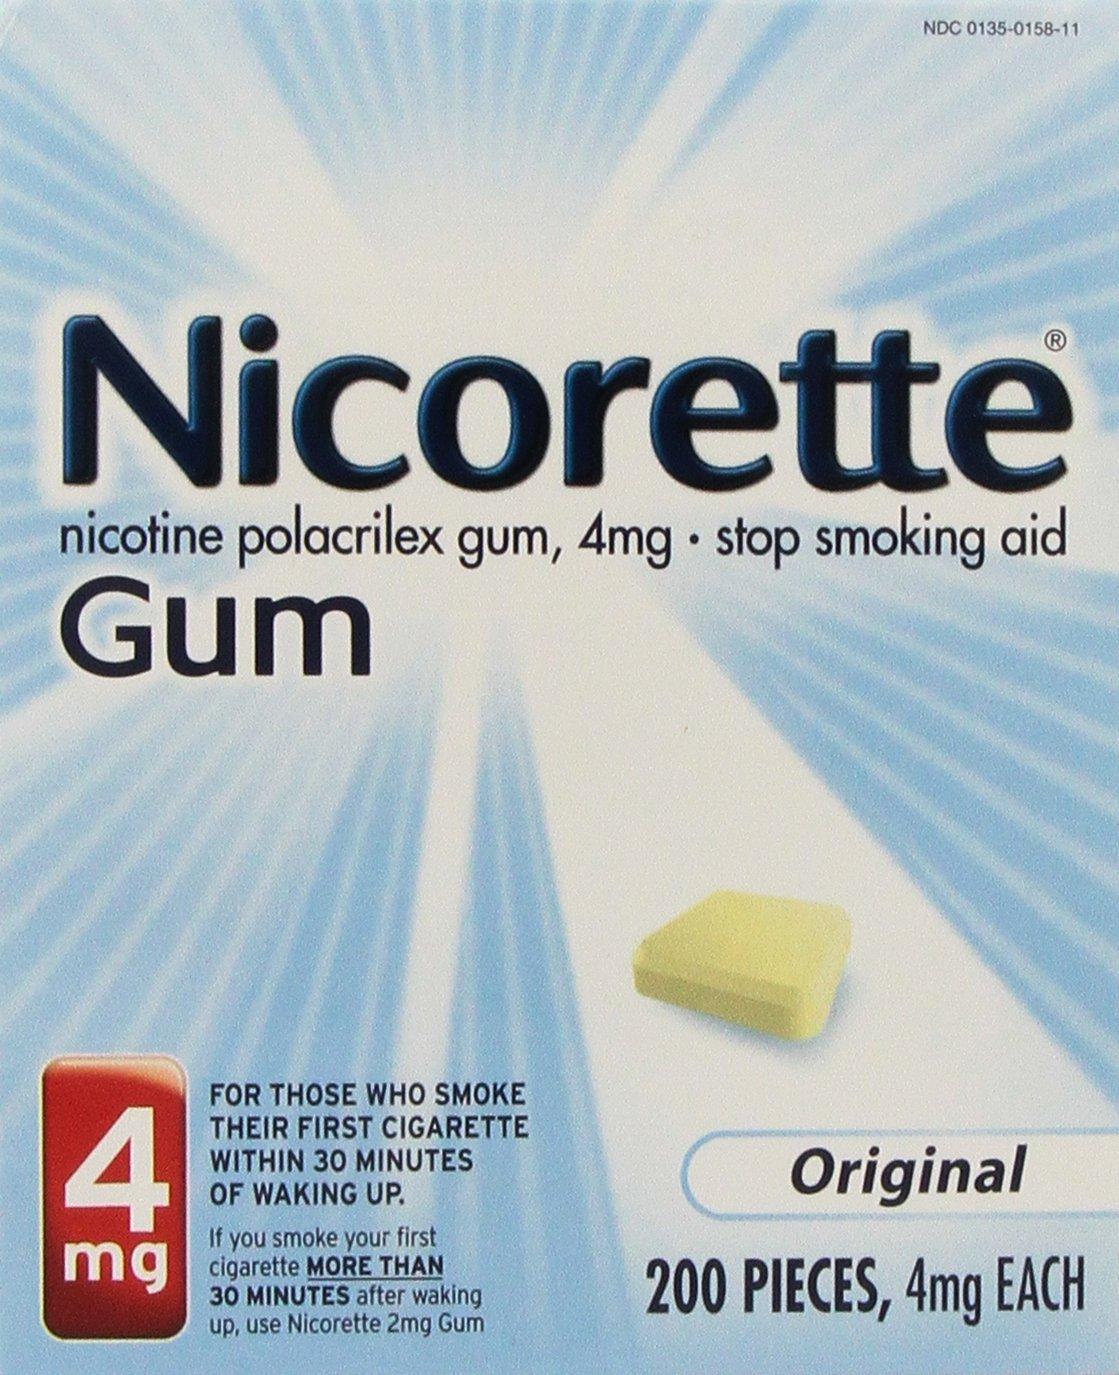 Nicorette Original Nicotine Stop Smoking OTC Gum 4mg 200 Count